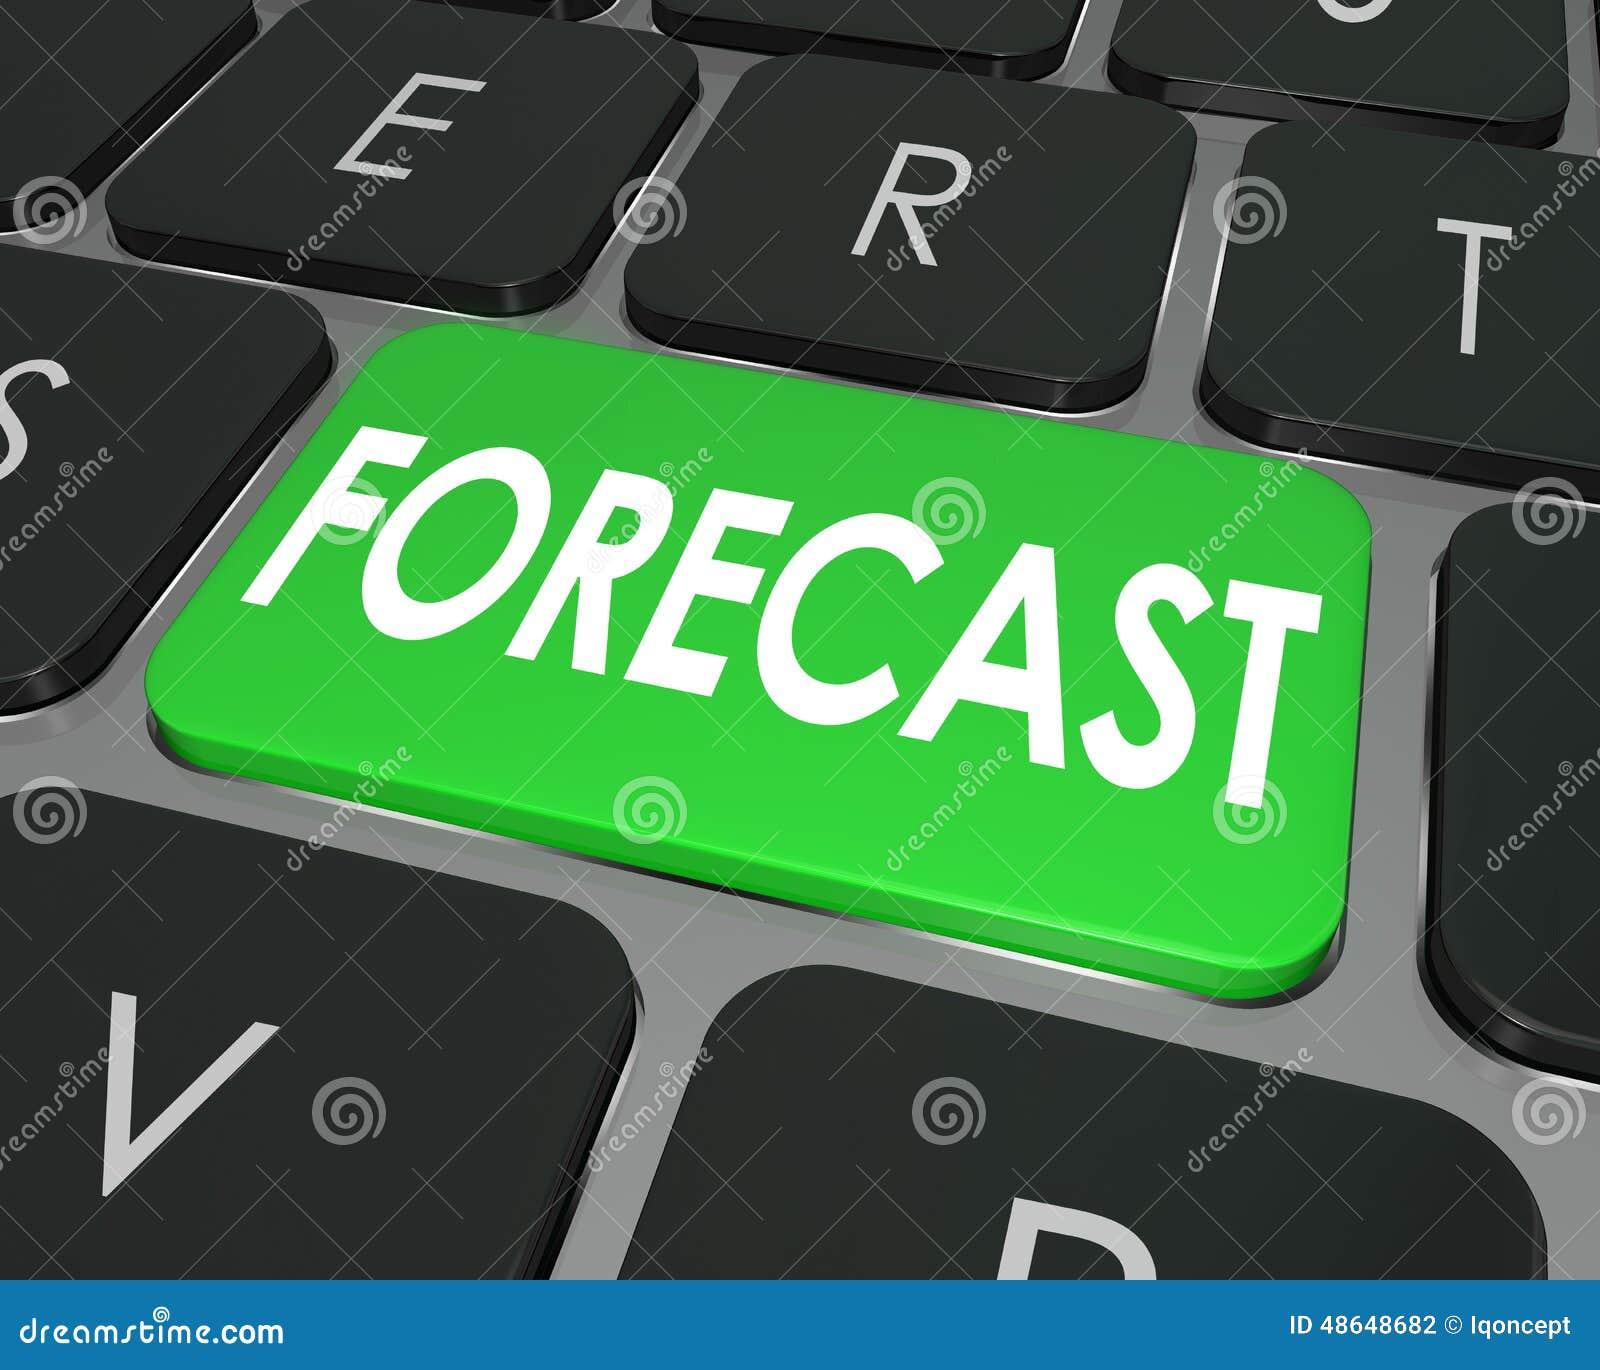 Business Travel Forecast For